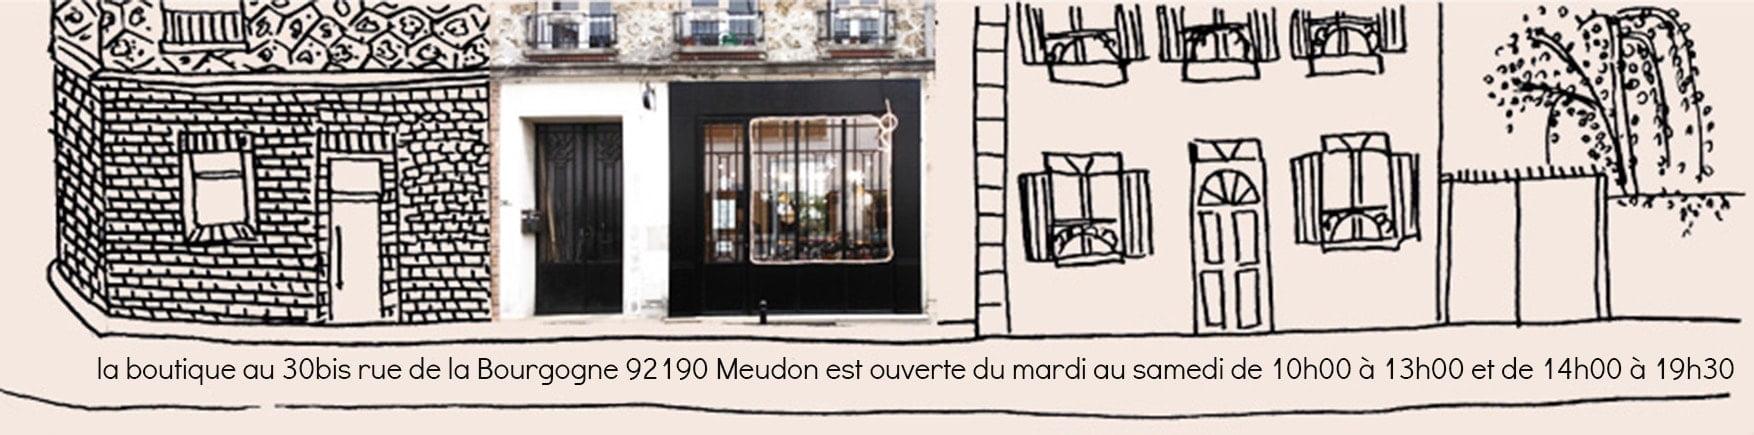 boutique Meudon